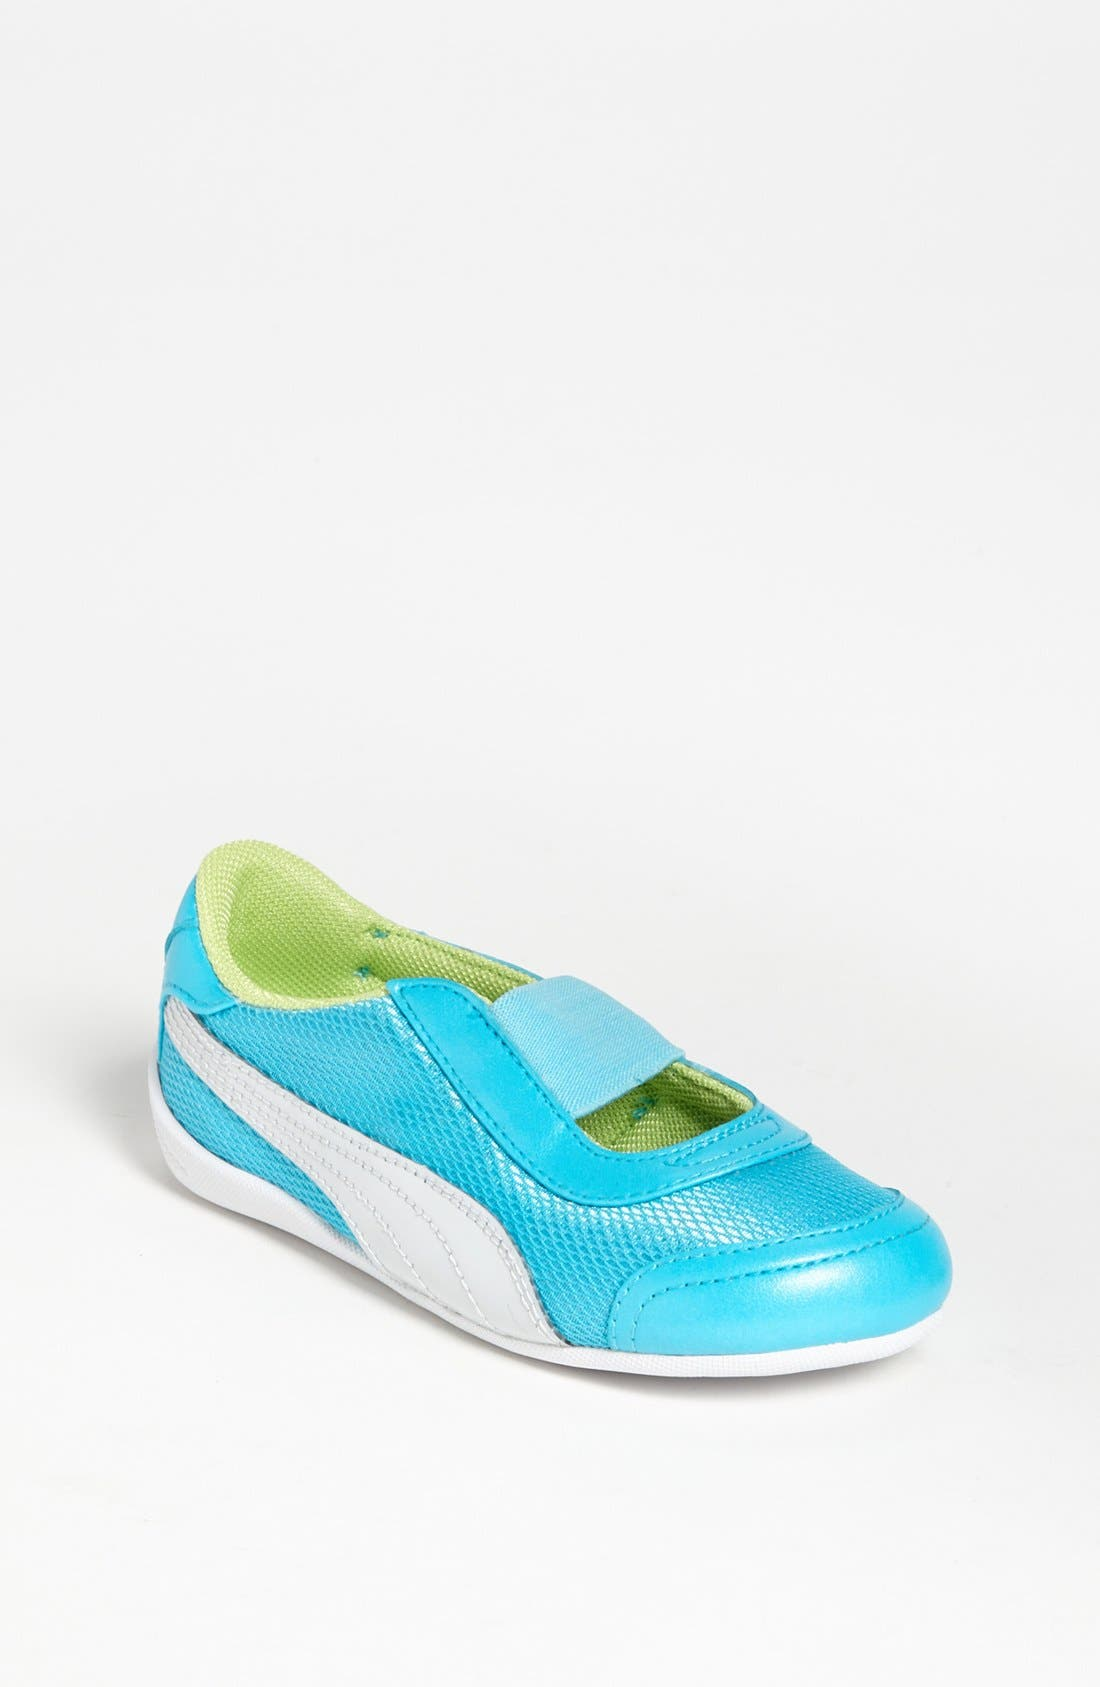 Alternate Image 1 Selected - PUMA 'Sneakerina' Slip-On (Walker & Toddler)